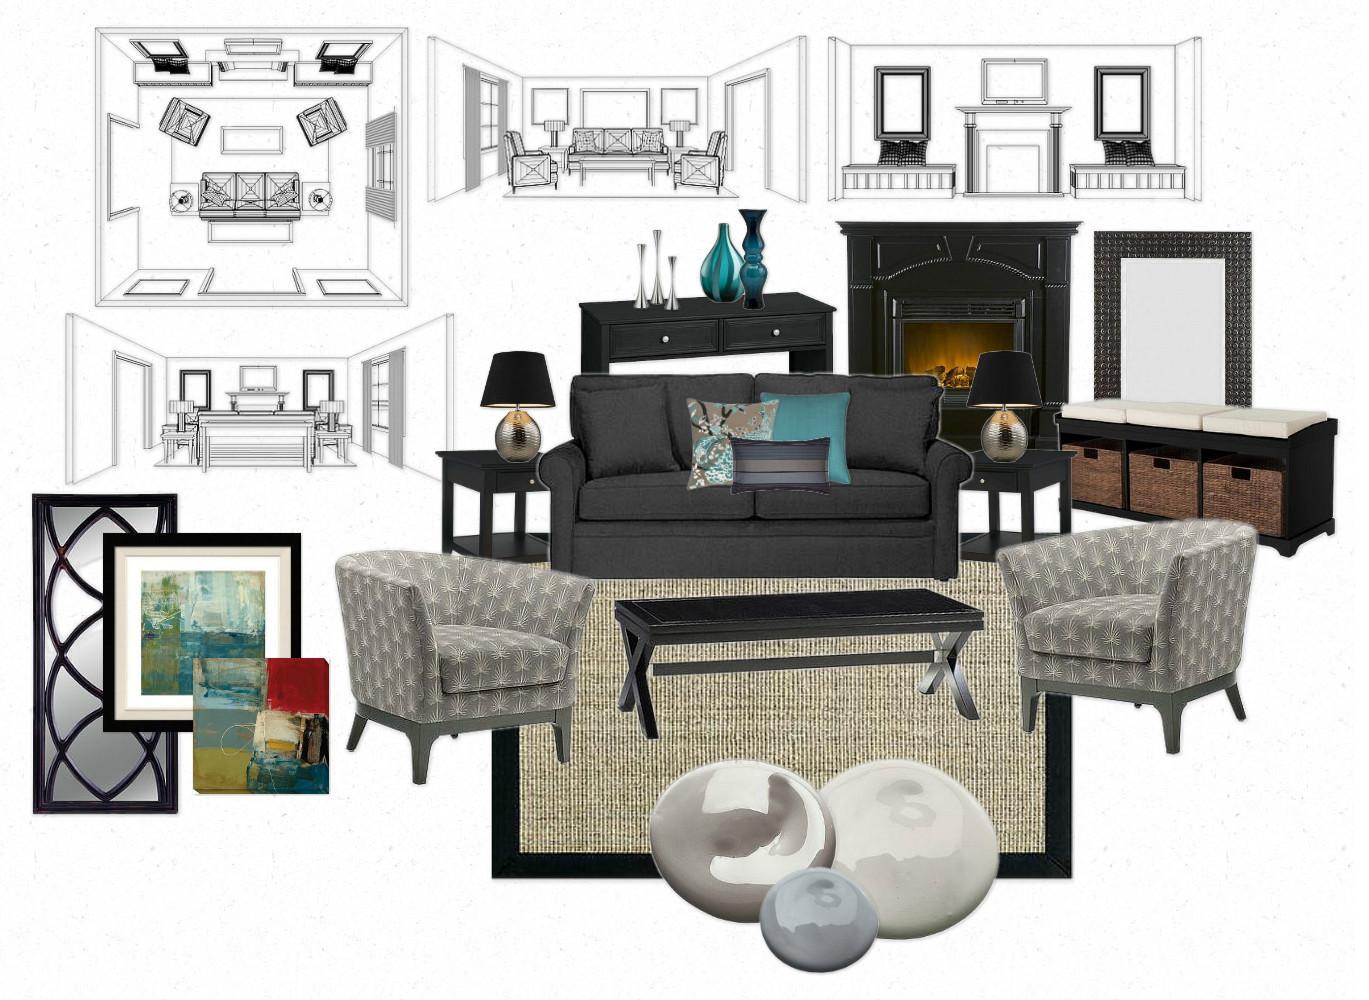 Interior design idea board stunning presentation board for Interior design board software